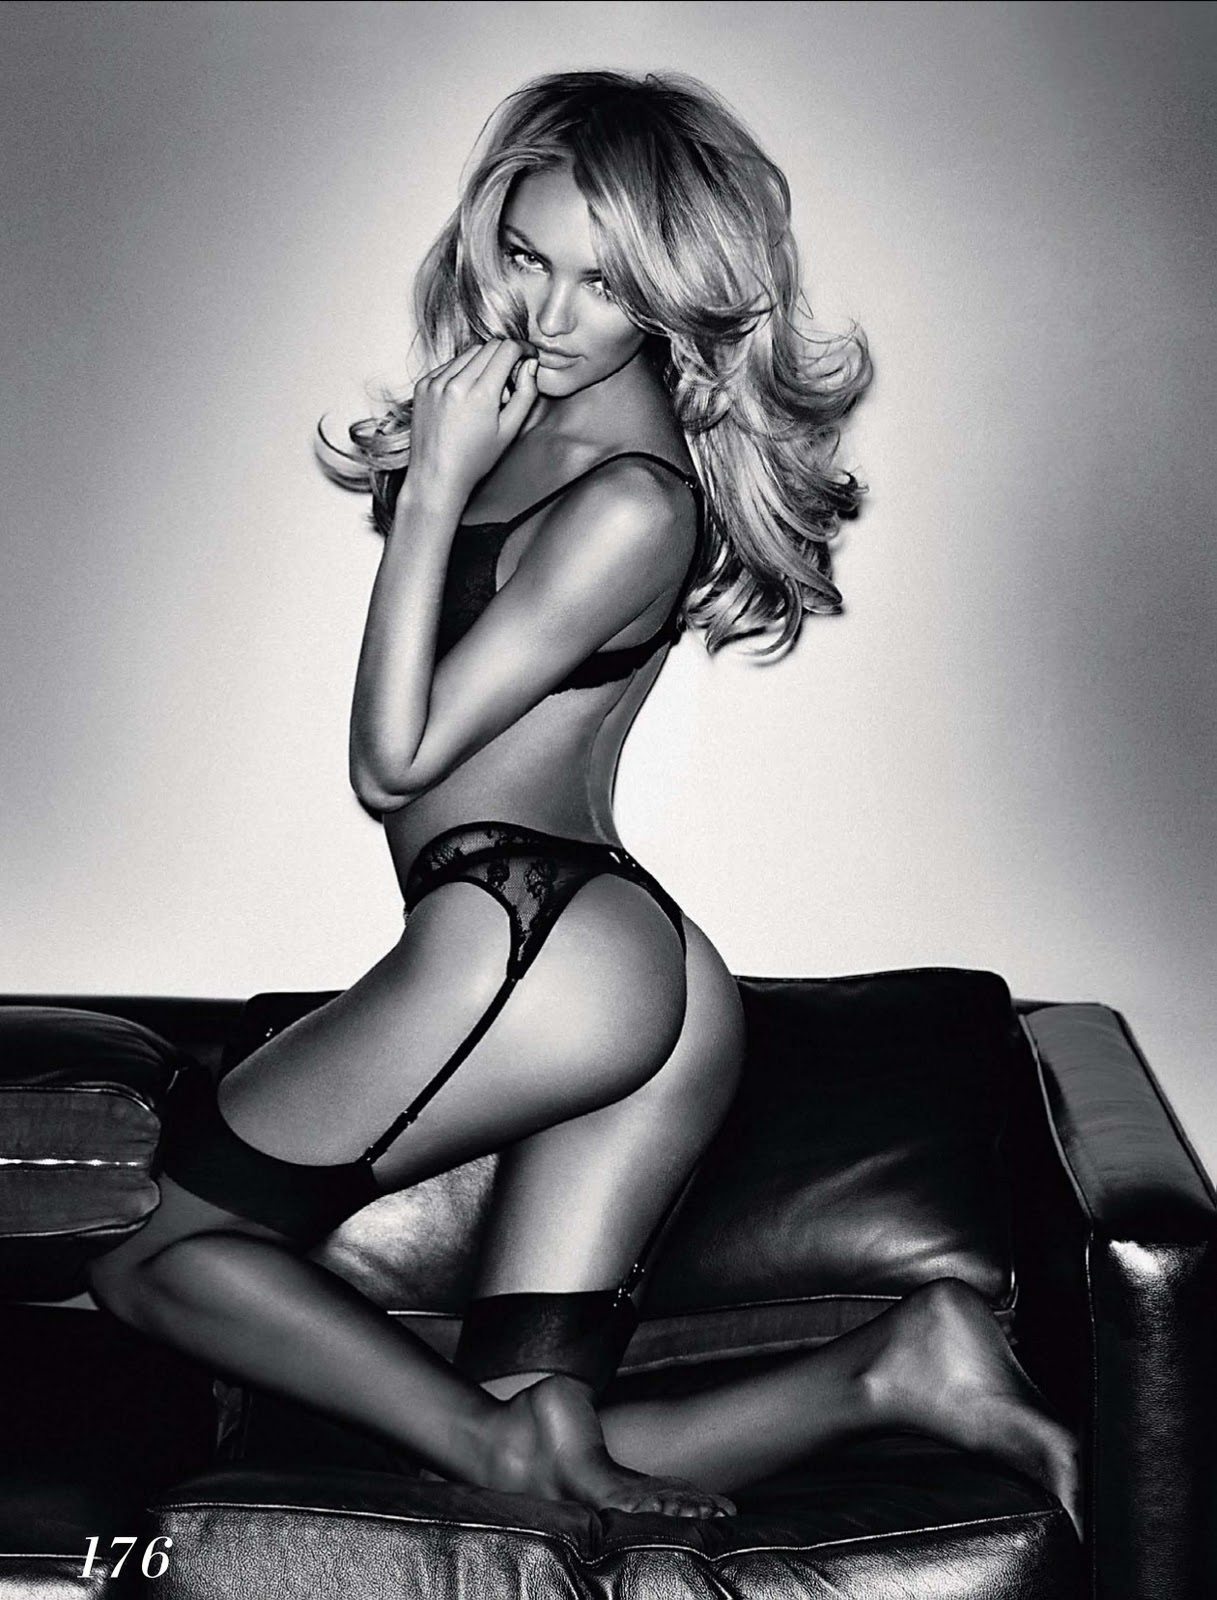 http://4.bp.blogspot.com/-2ufrENqDZKs/TZX93HkxVPI/AAAAAAAAAAk/9KH_Cg3Ja7M/s1600/221341262_Candice_Swanepoel_GQ_Russia_04_2011_94_123_561lo.jpg